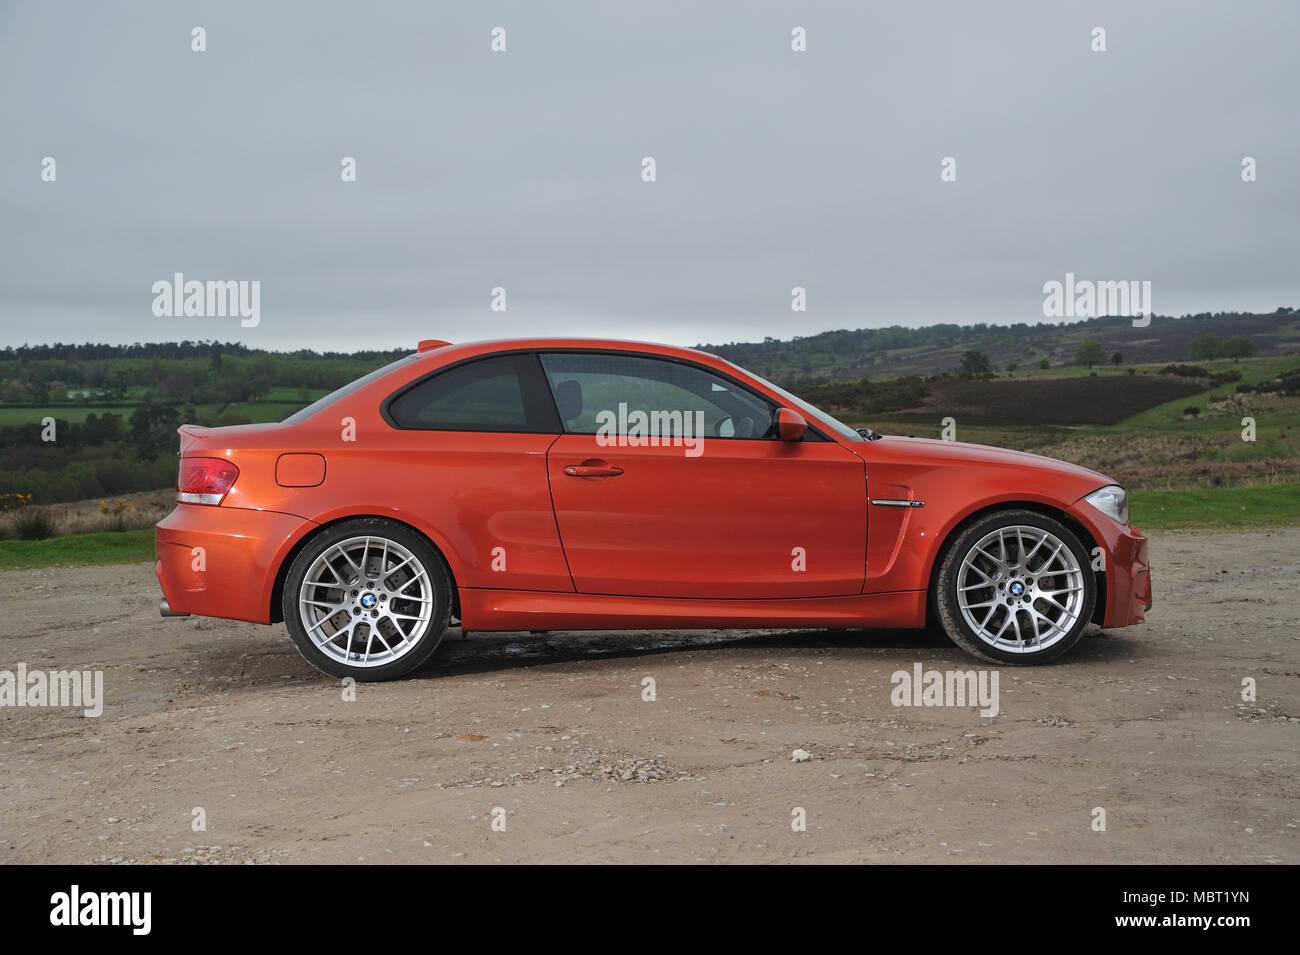 E87 Bmw 1m 1 Series M Sport Coupe Stock Photo Alamy